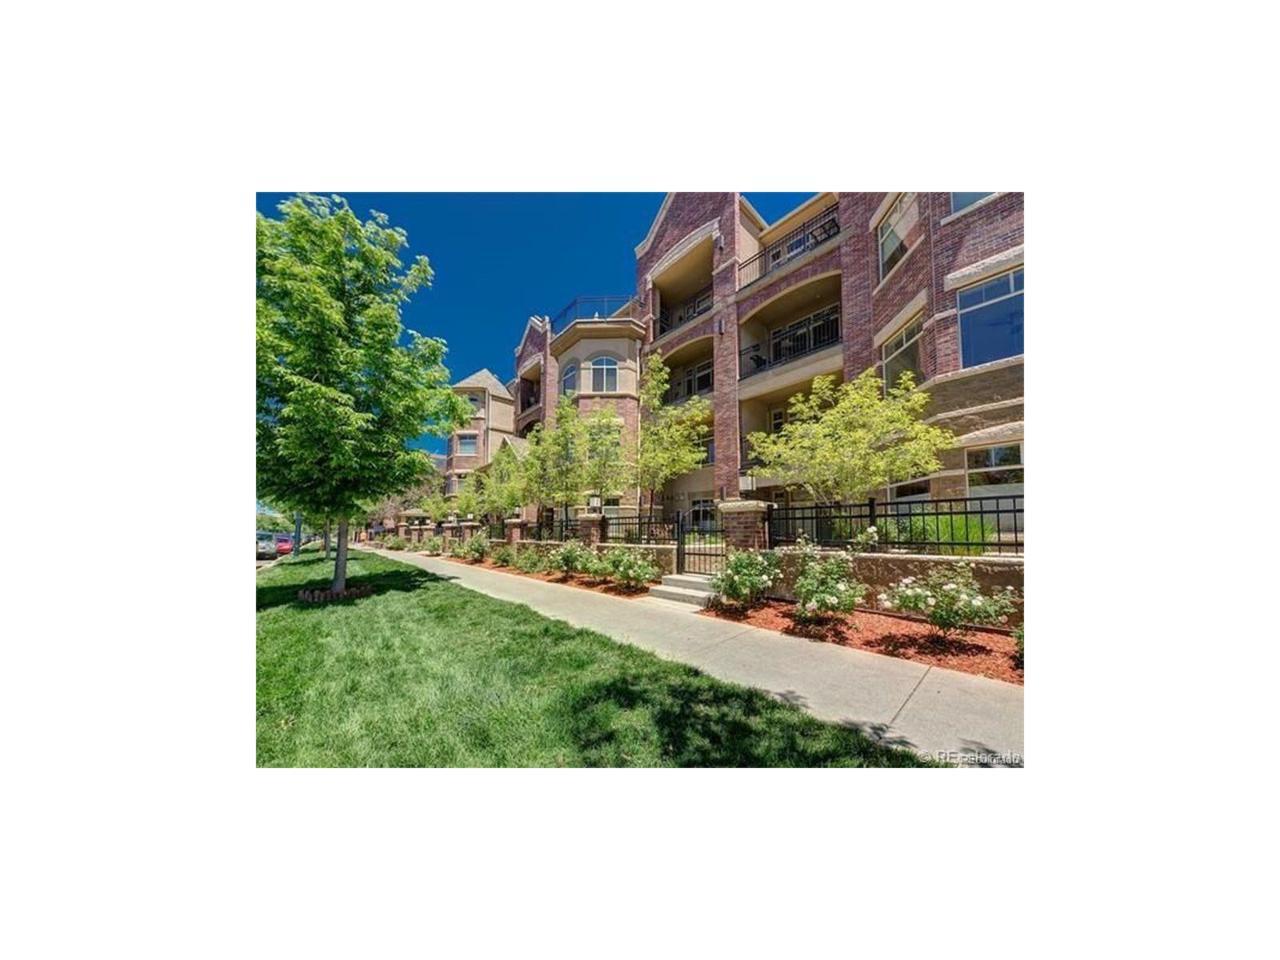 1100 N Grant Street #301, Denver, CO 80203 (MLS #6266370) :: 8z Real Estate